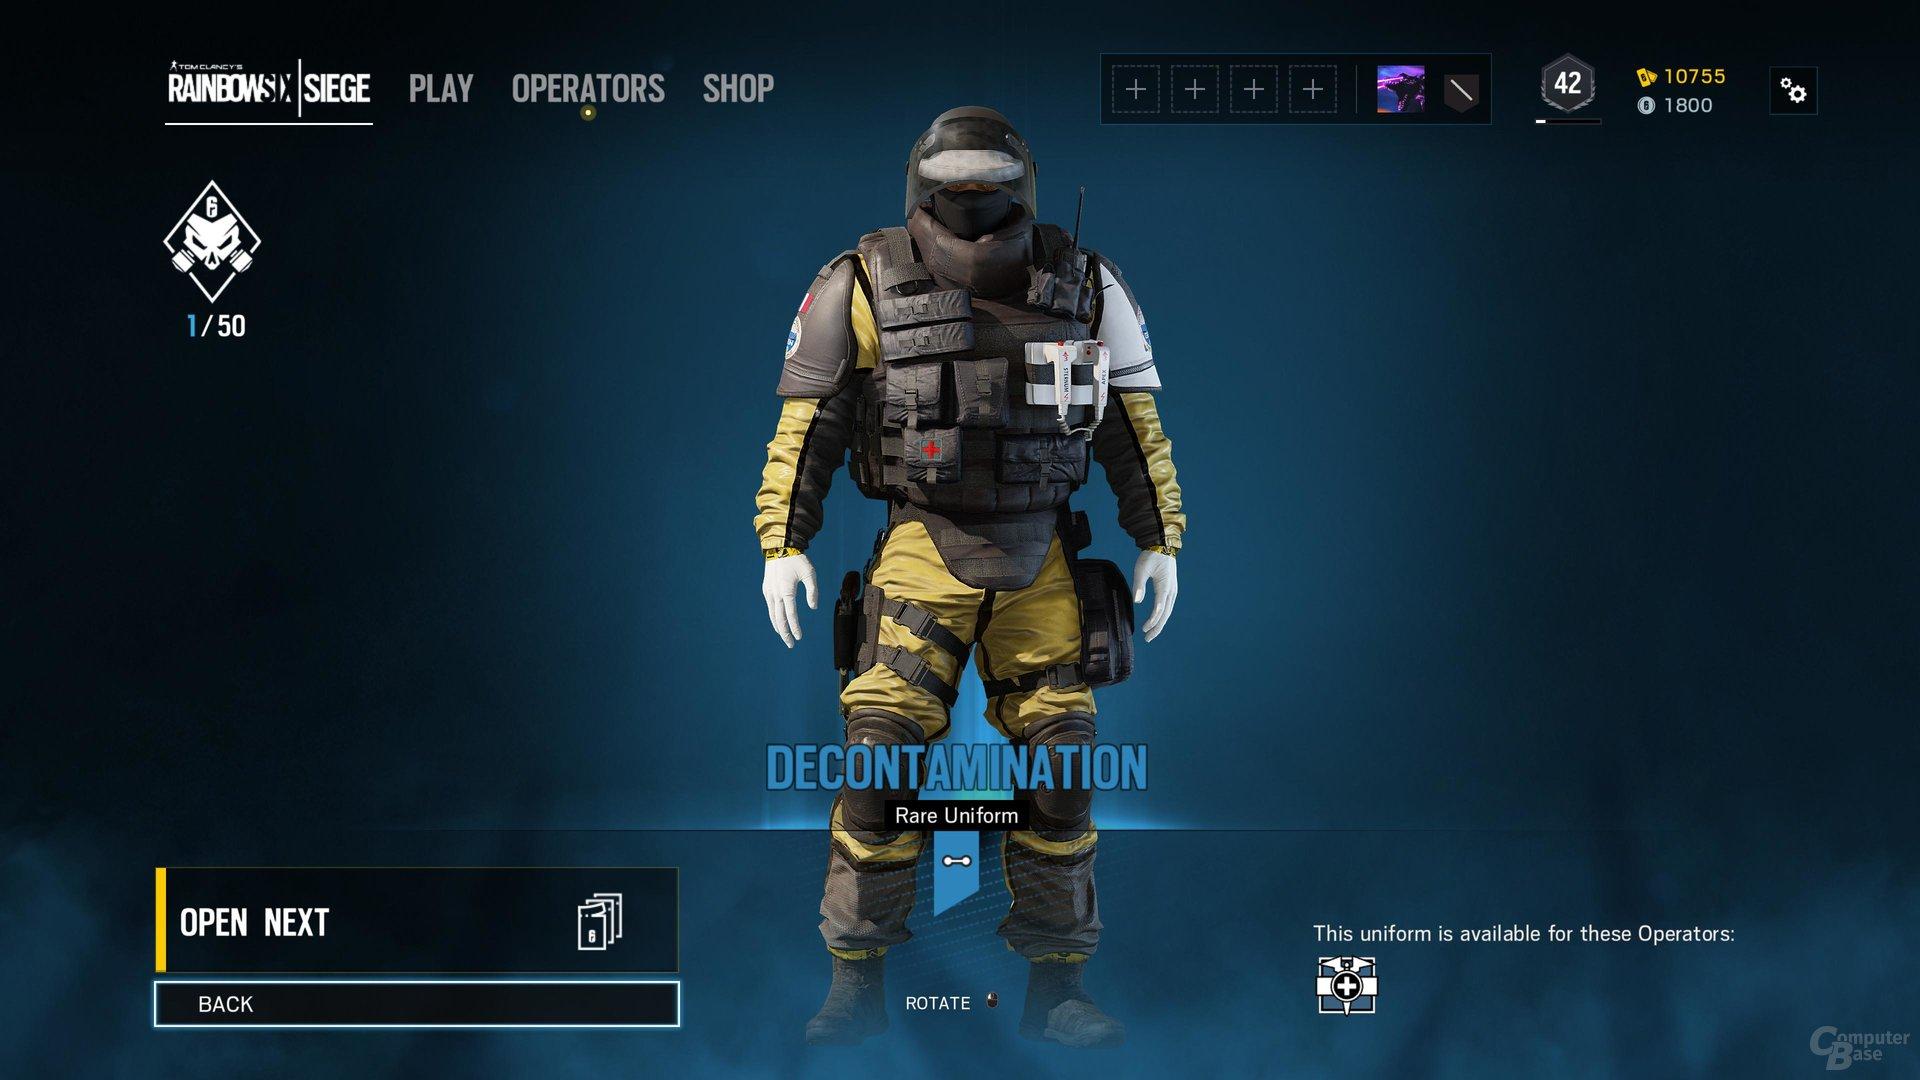 Outbreak-Packs enthalten unter anderem gelbe Uniformen